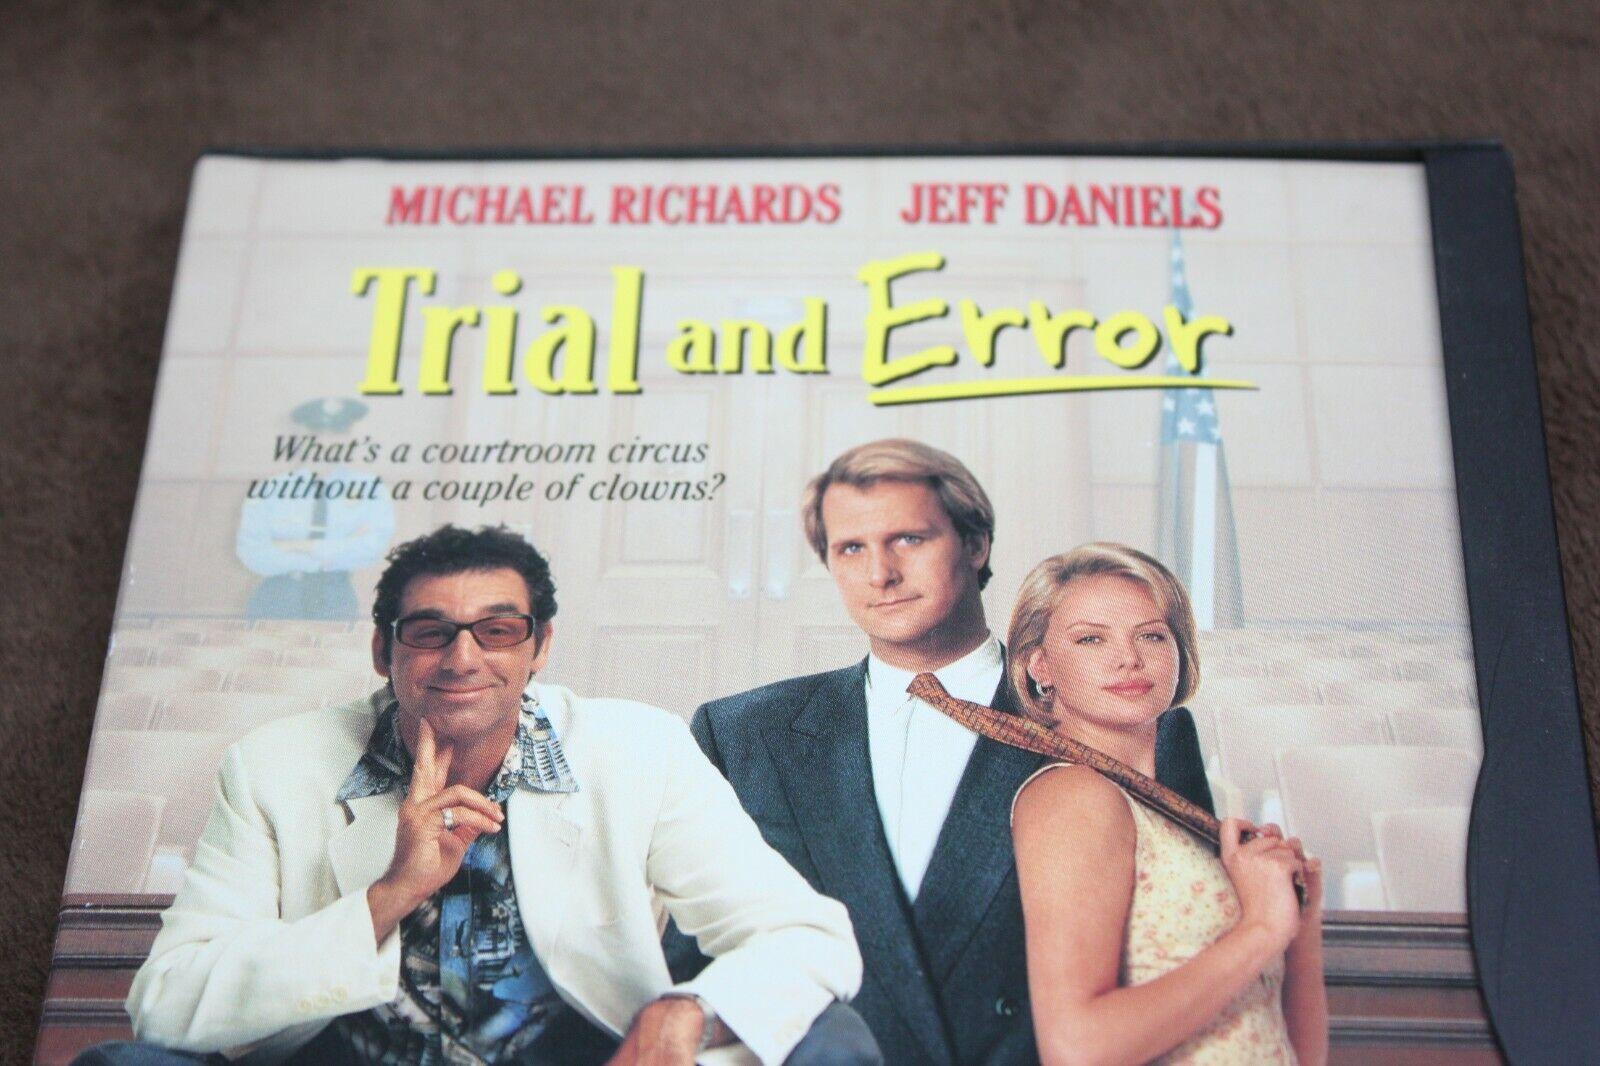 Trial And Error DVD, 1999, Fullscreen, Widescreen inva  - $4.99